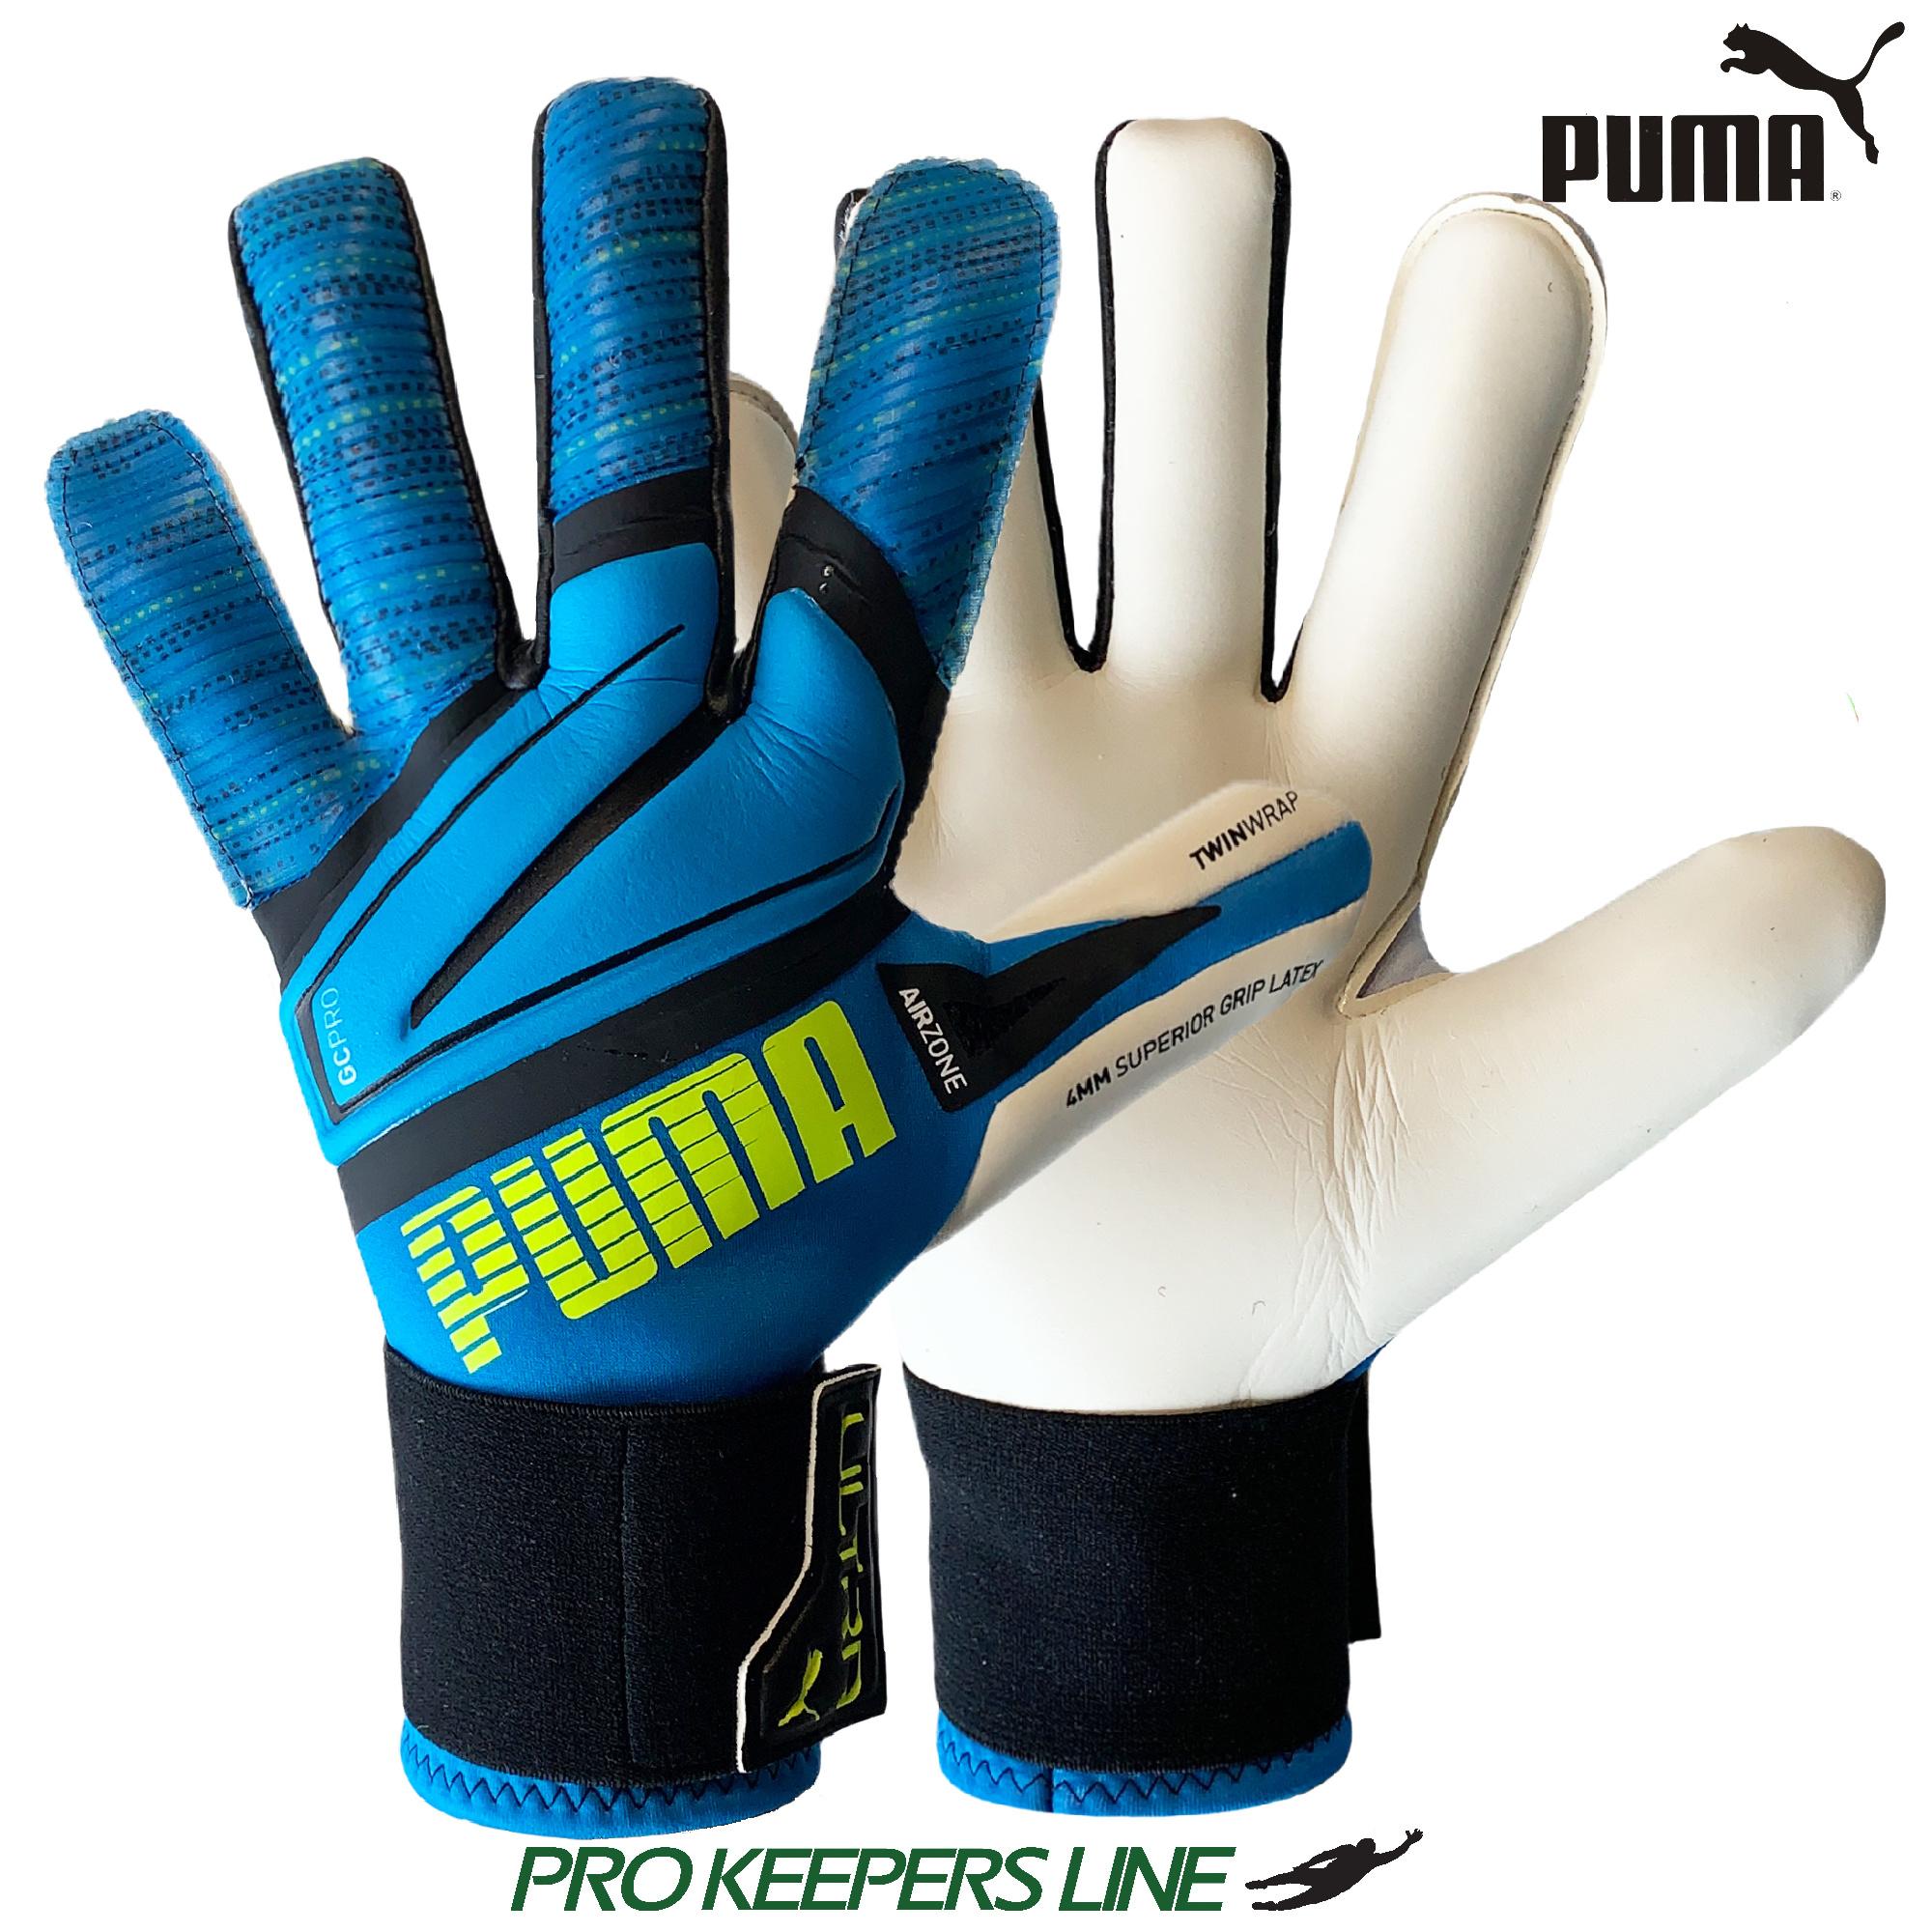 PUMA ULTRA GRIP 1 HYBRID PRO ENERGY BLUE/ YELLOW ALERT